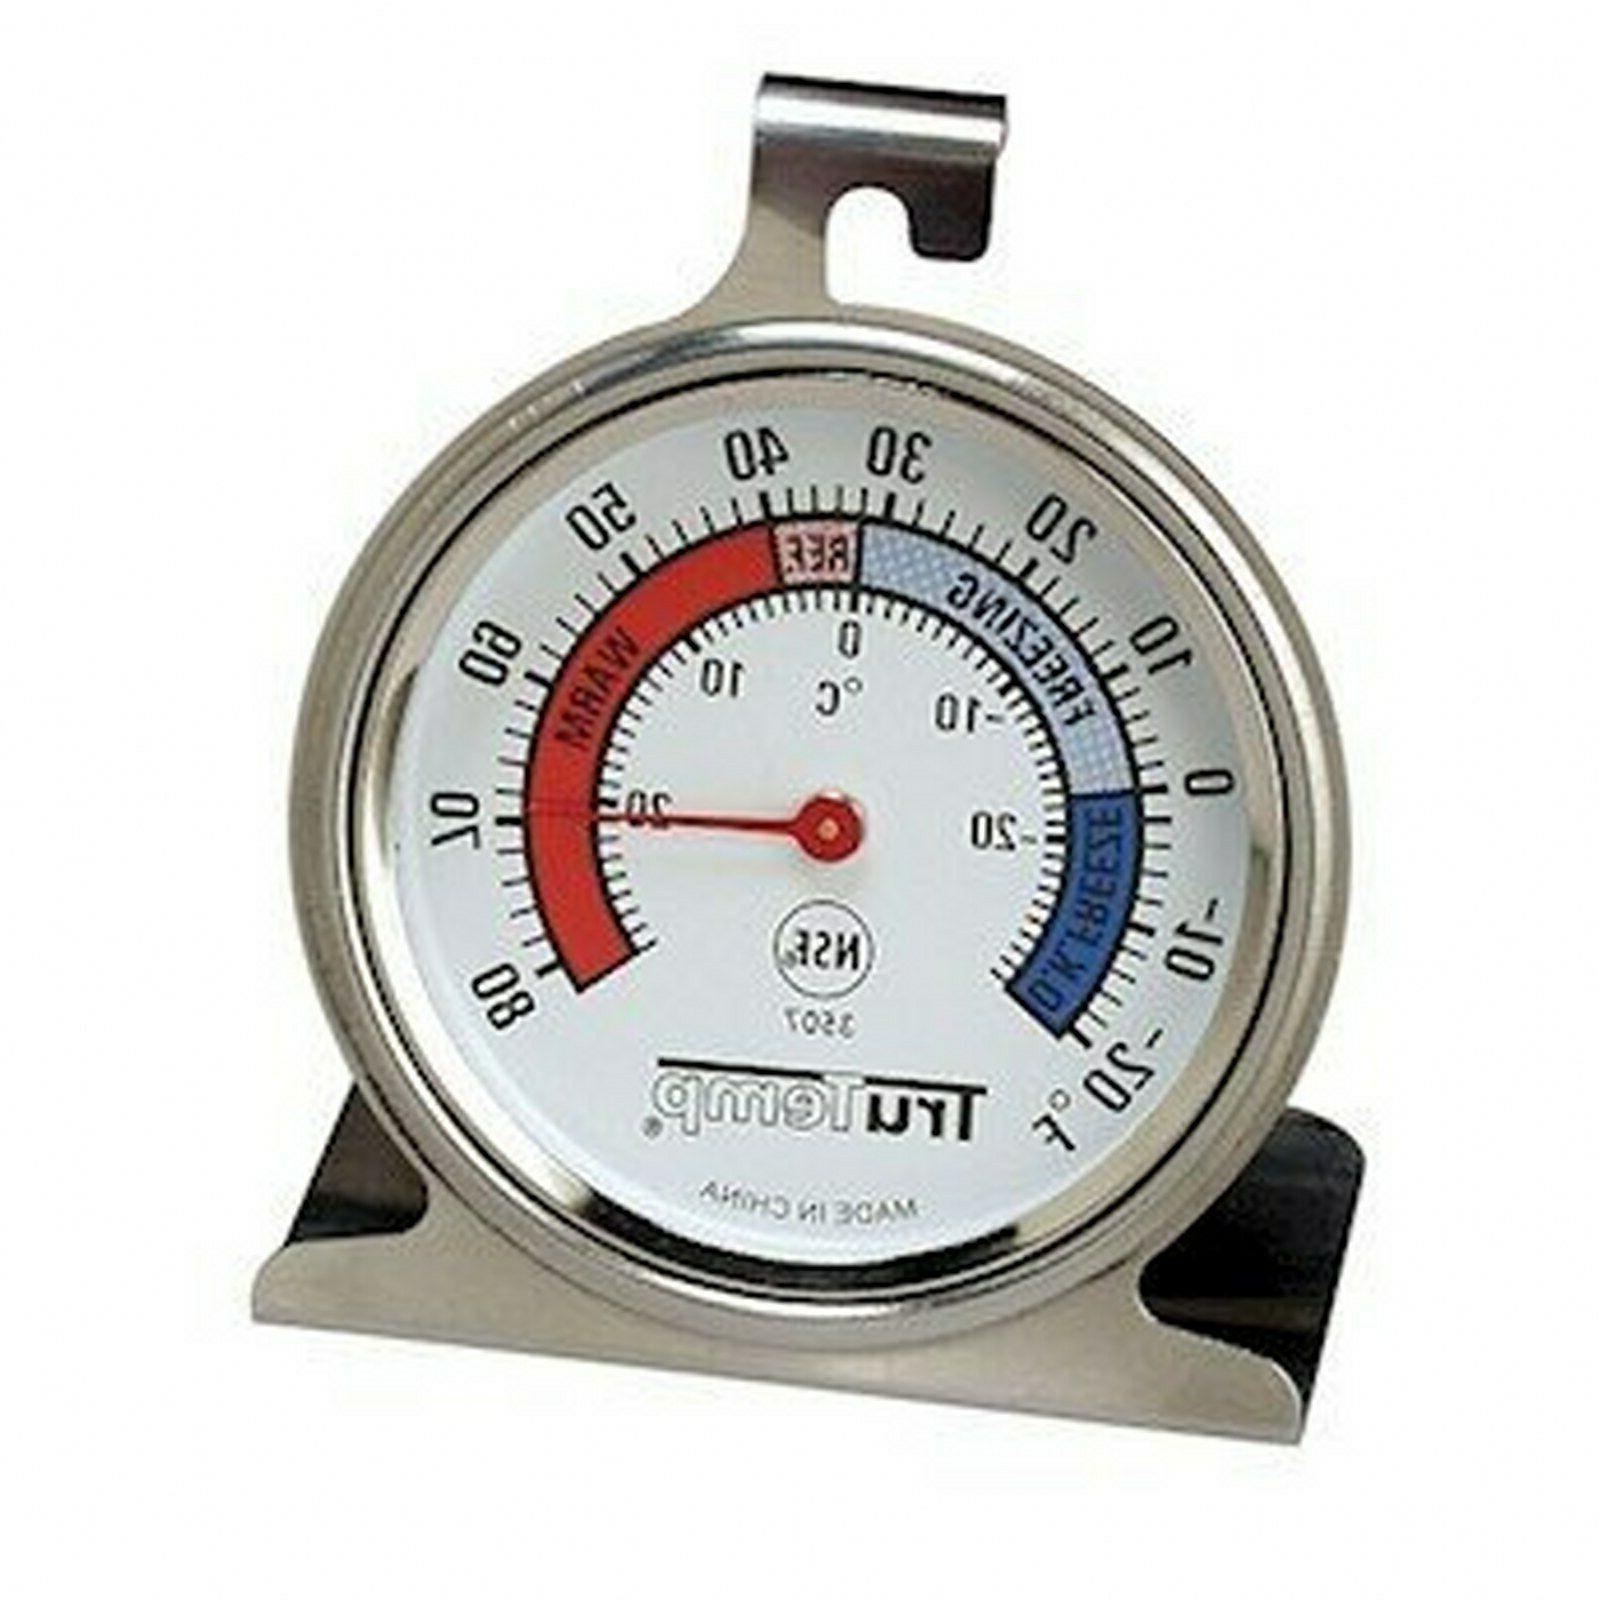 Taylor TruTemp Freezer Refrigerator Analog Dial Thermometer